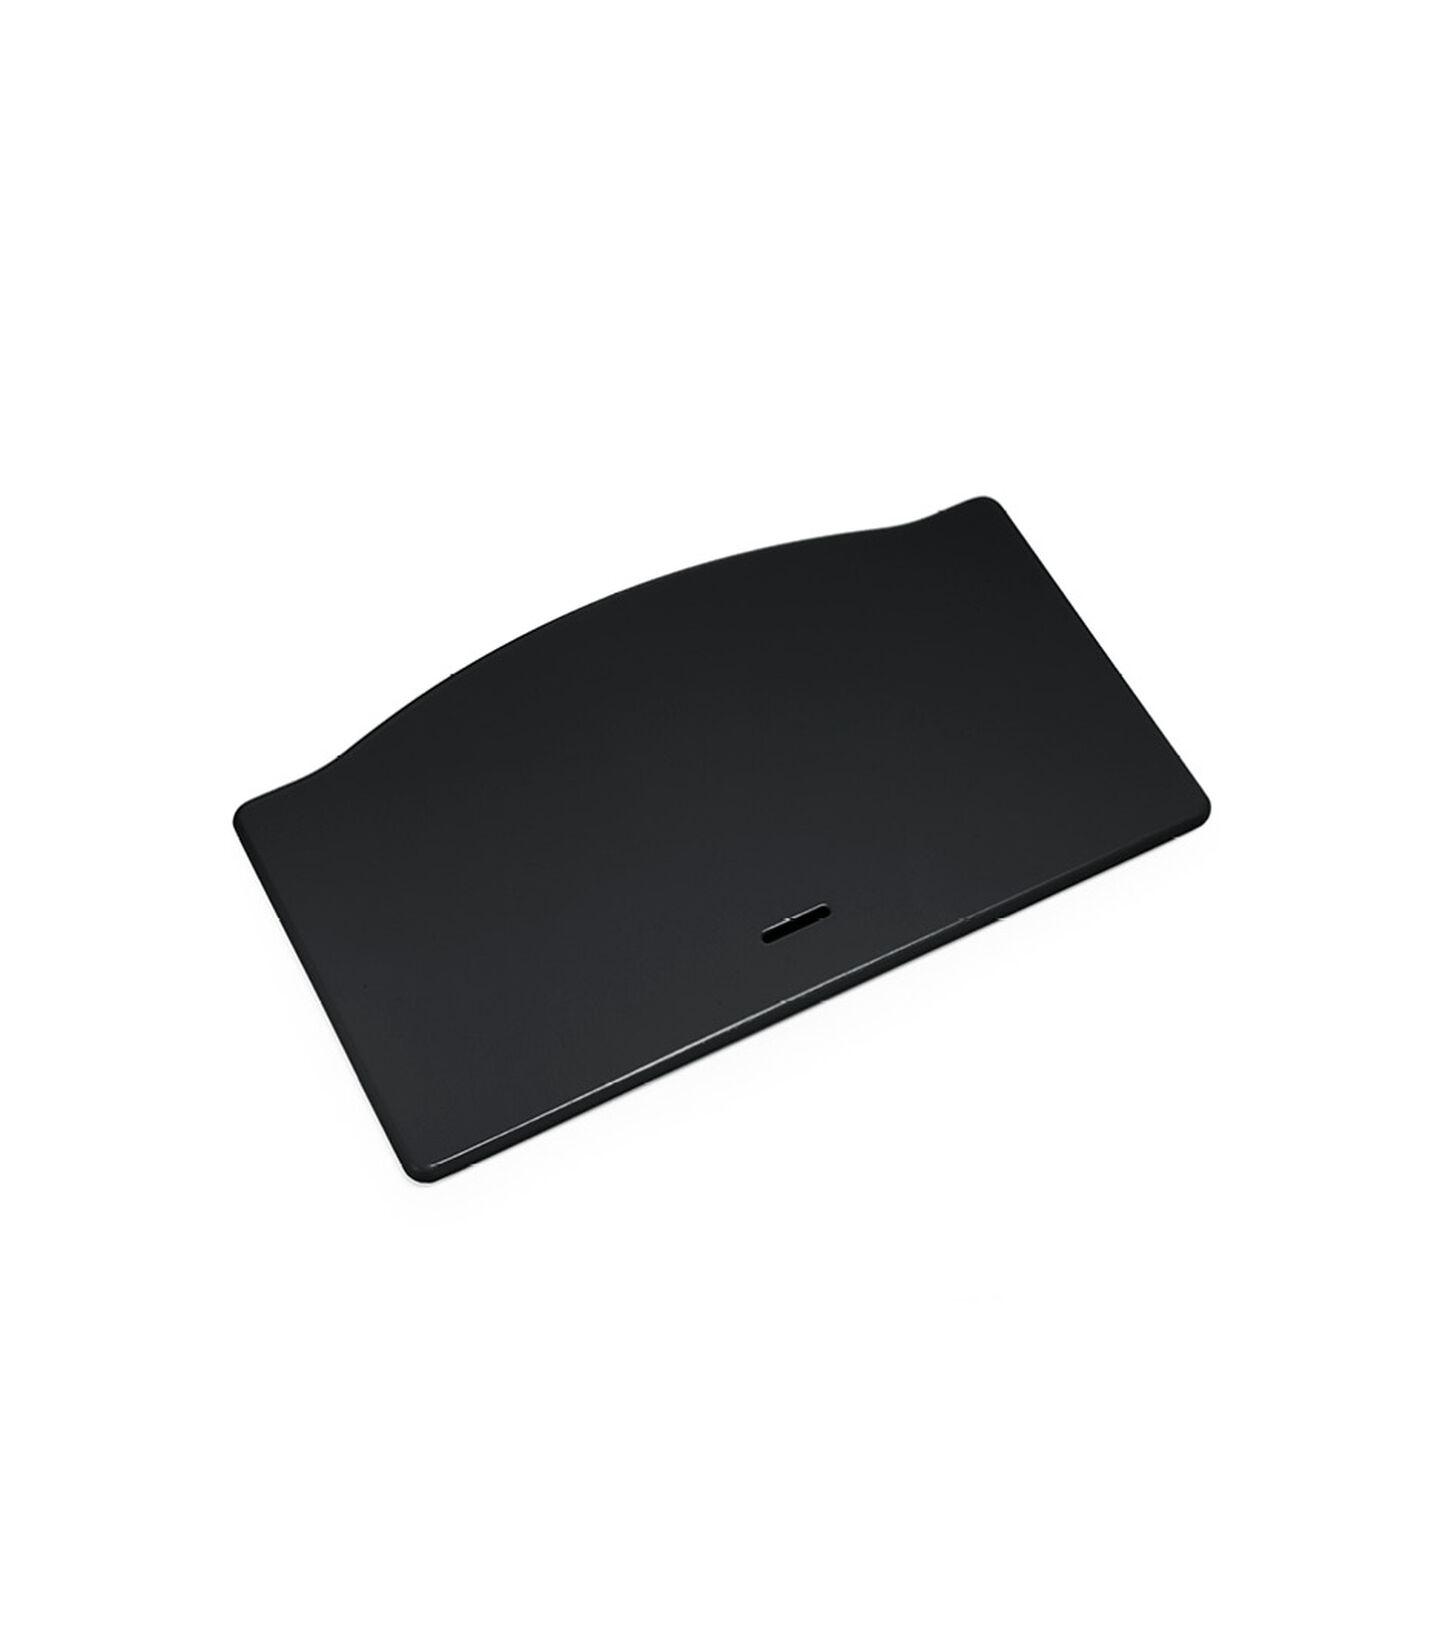 Tripp Trapp® Seatplate Black, Black, mainview view 1